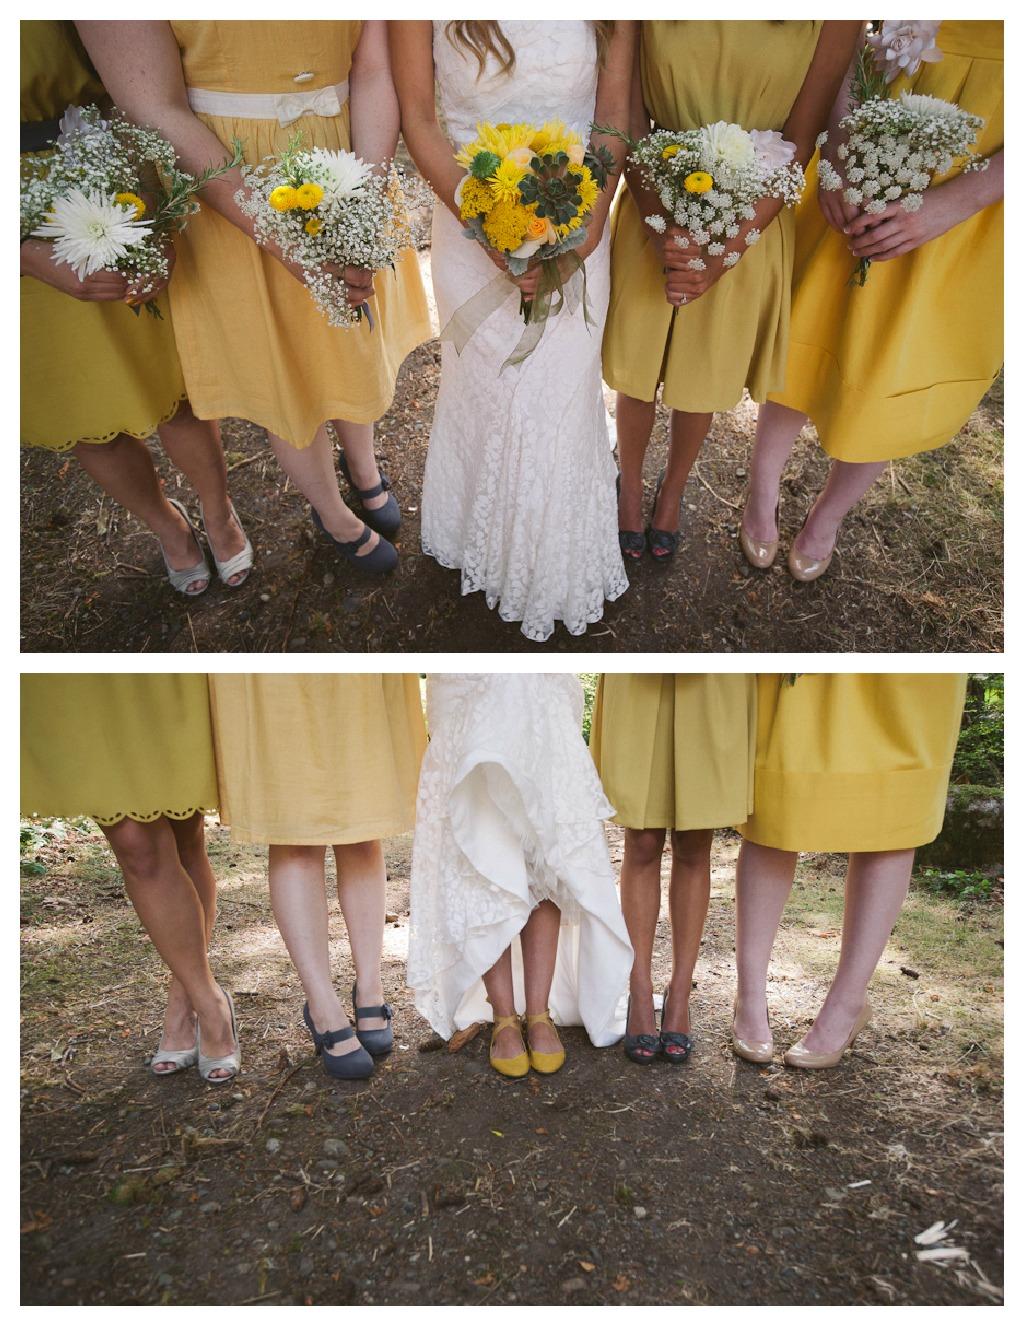 Vintage Woodsy Rustic Wedding Rustic Wedding Chic